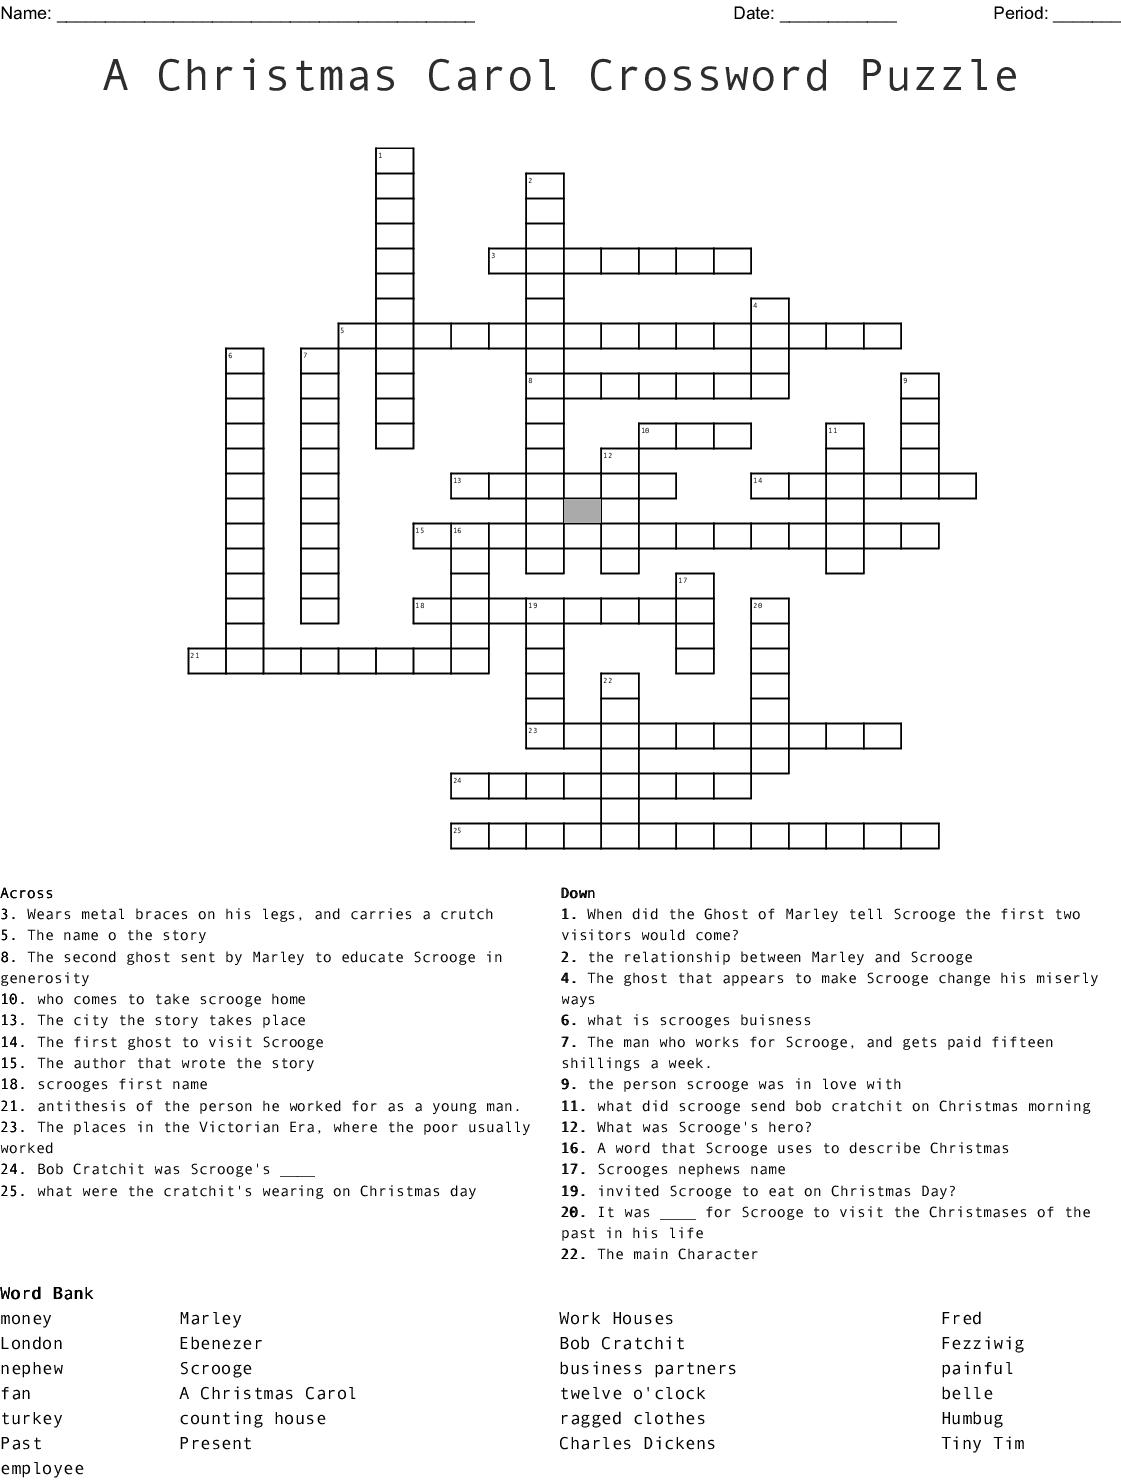 A Christmas Carol Crossword Puzzle